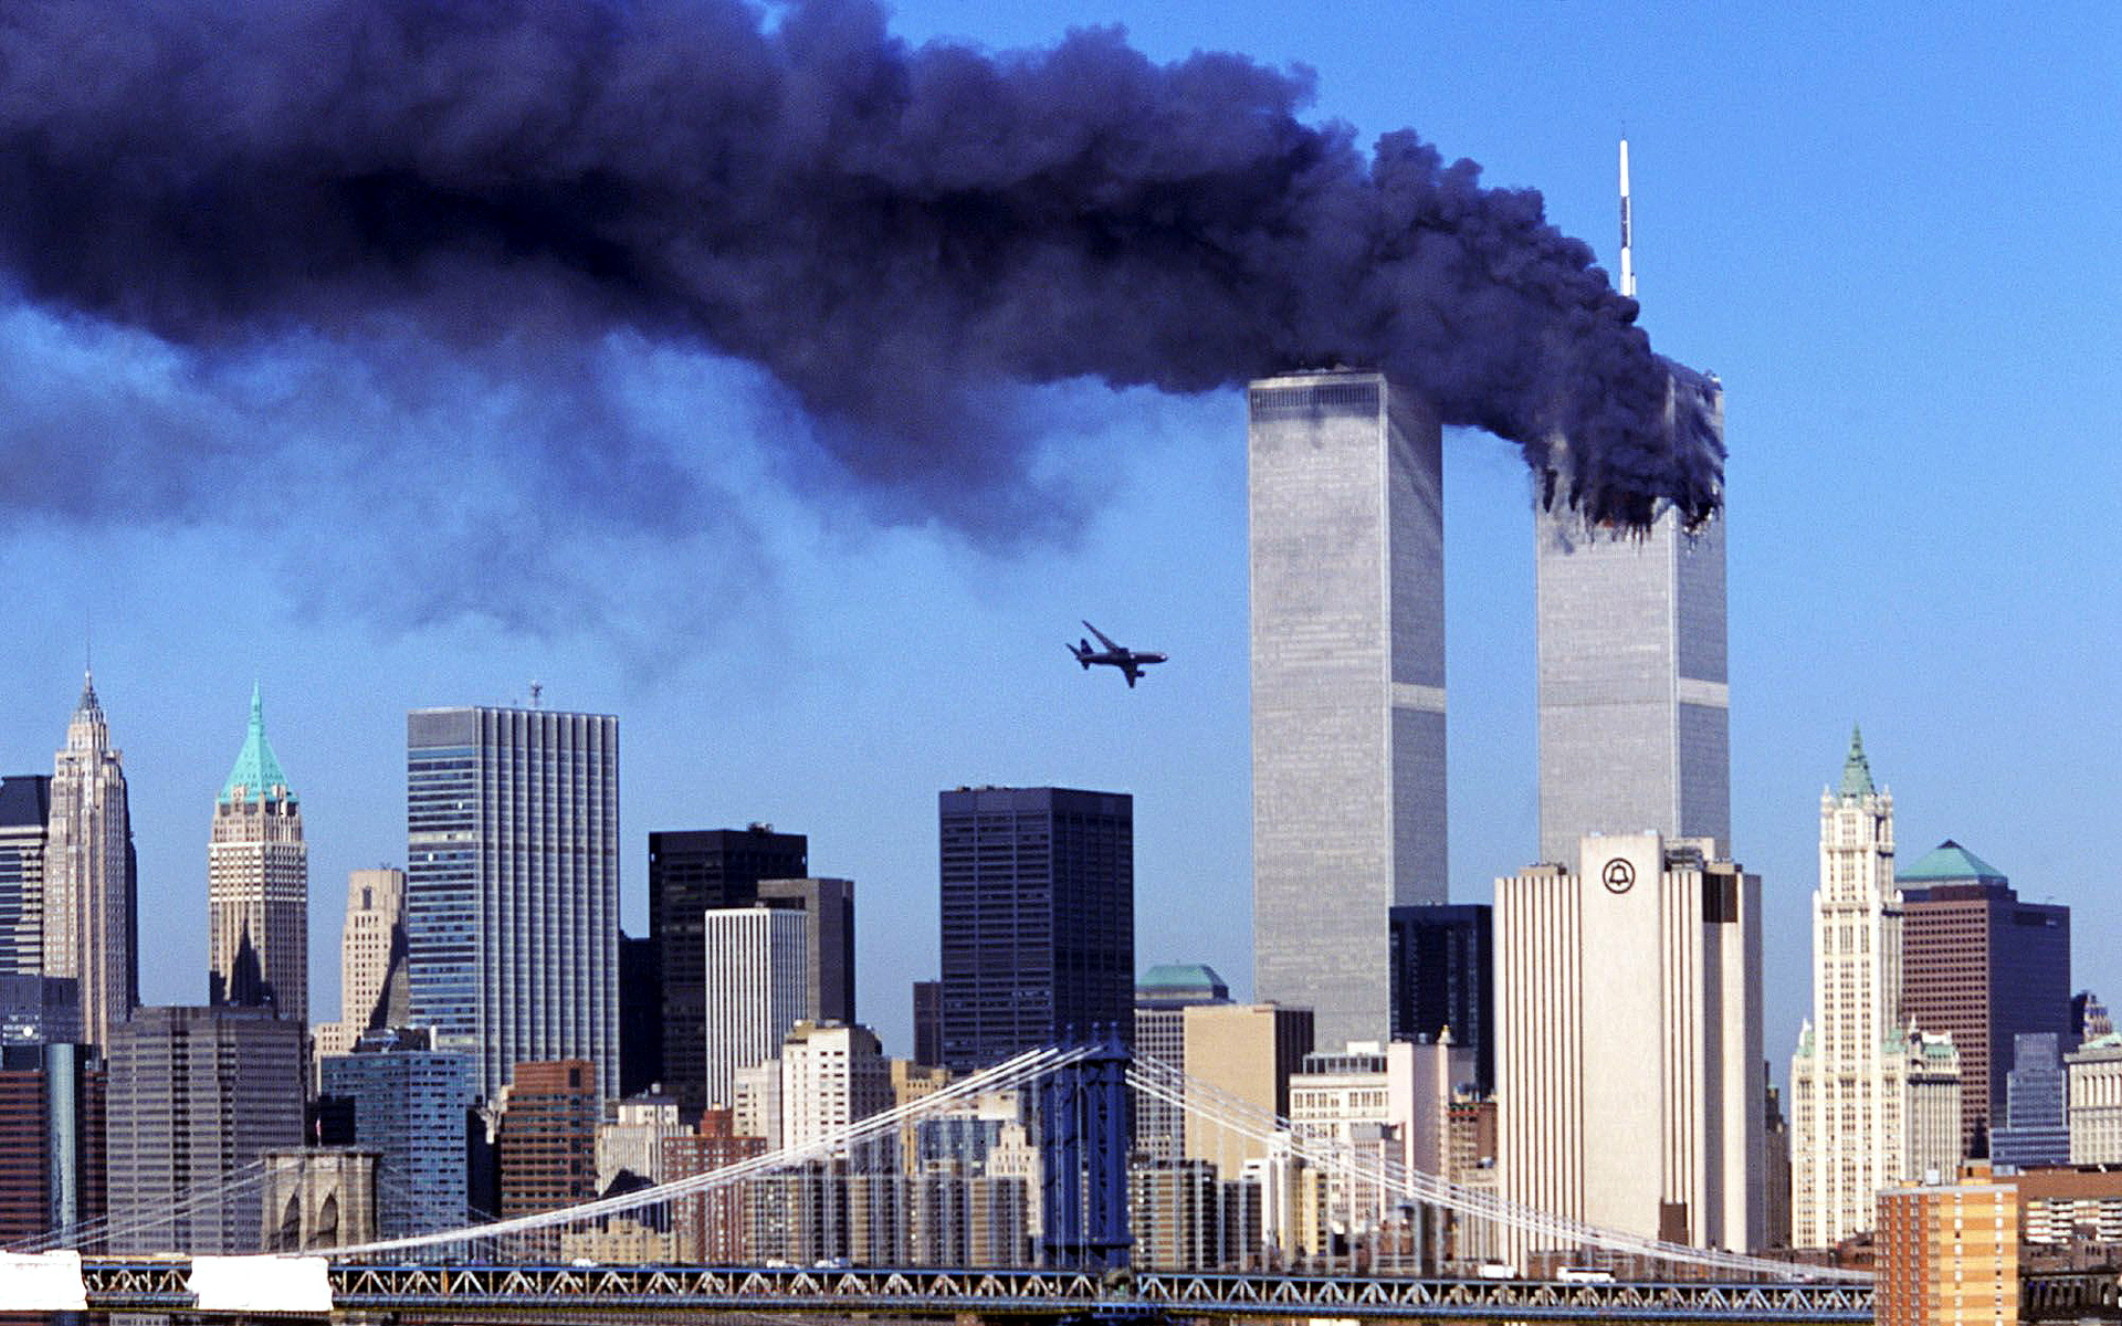 2001/09/11